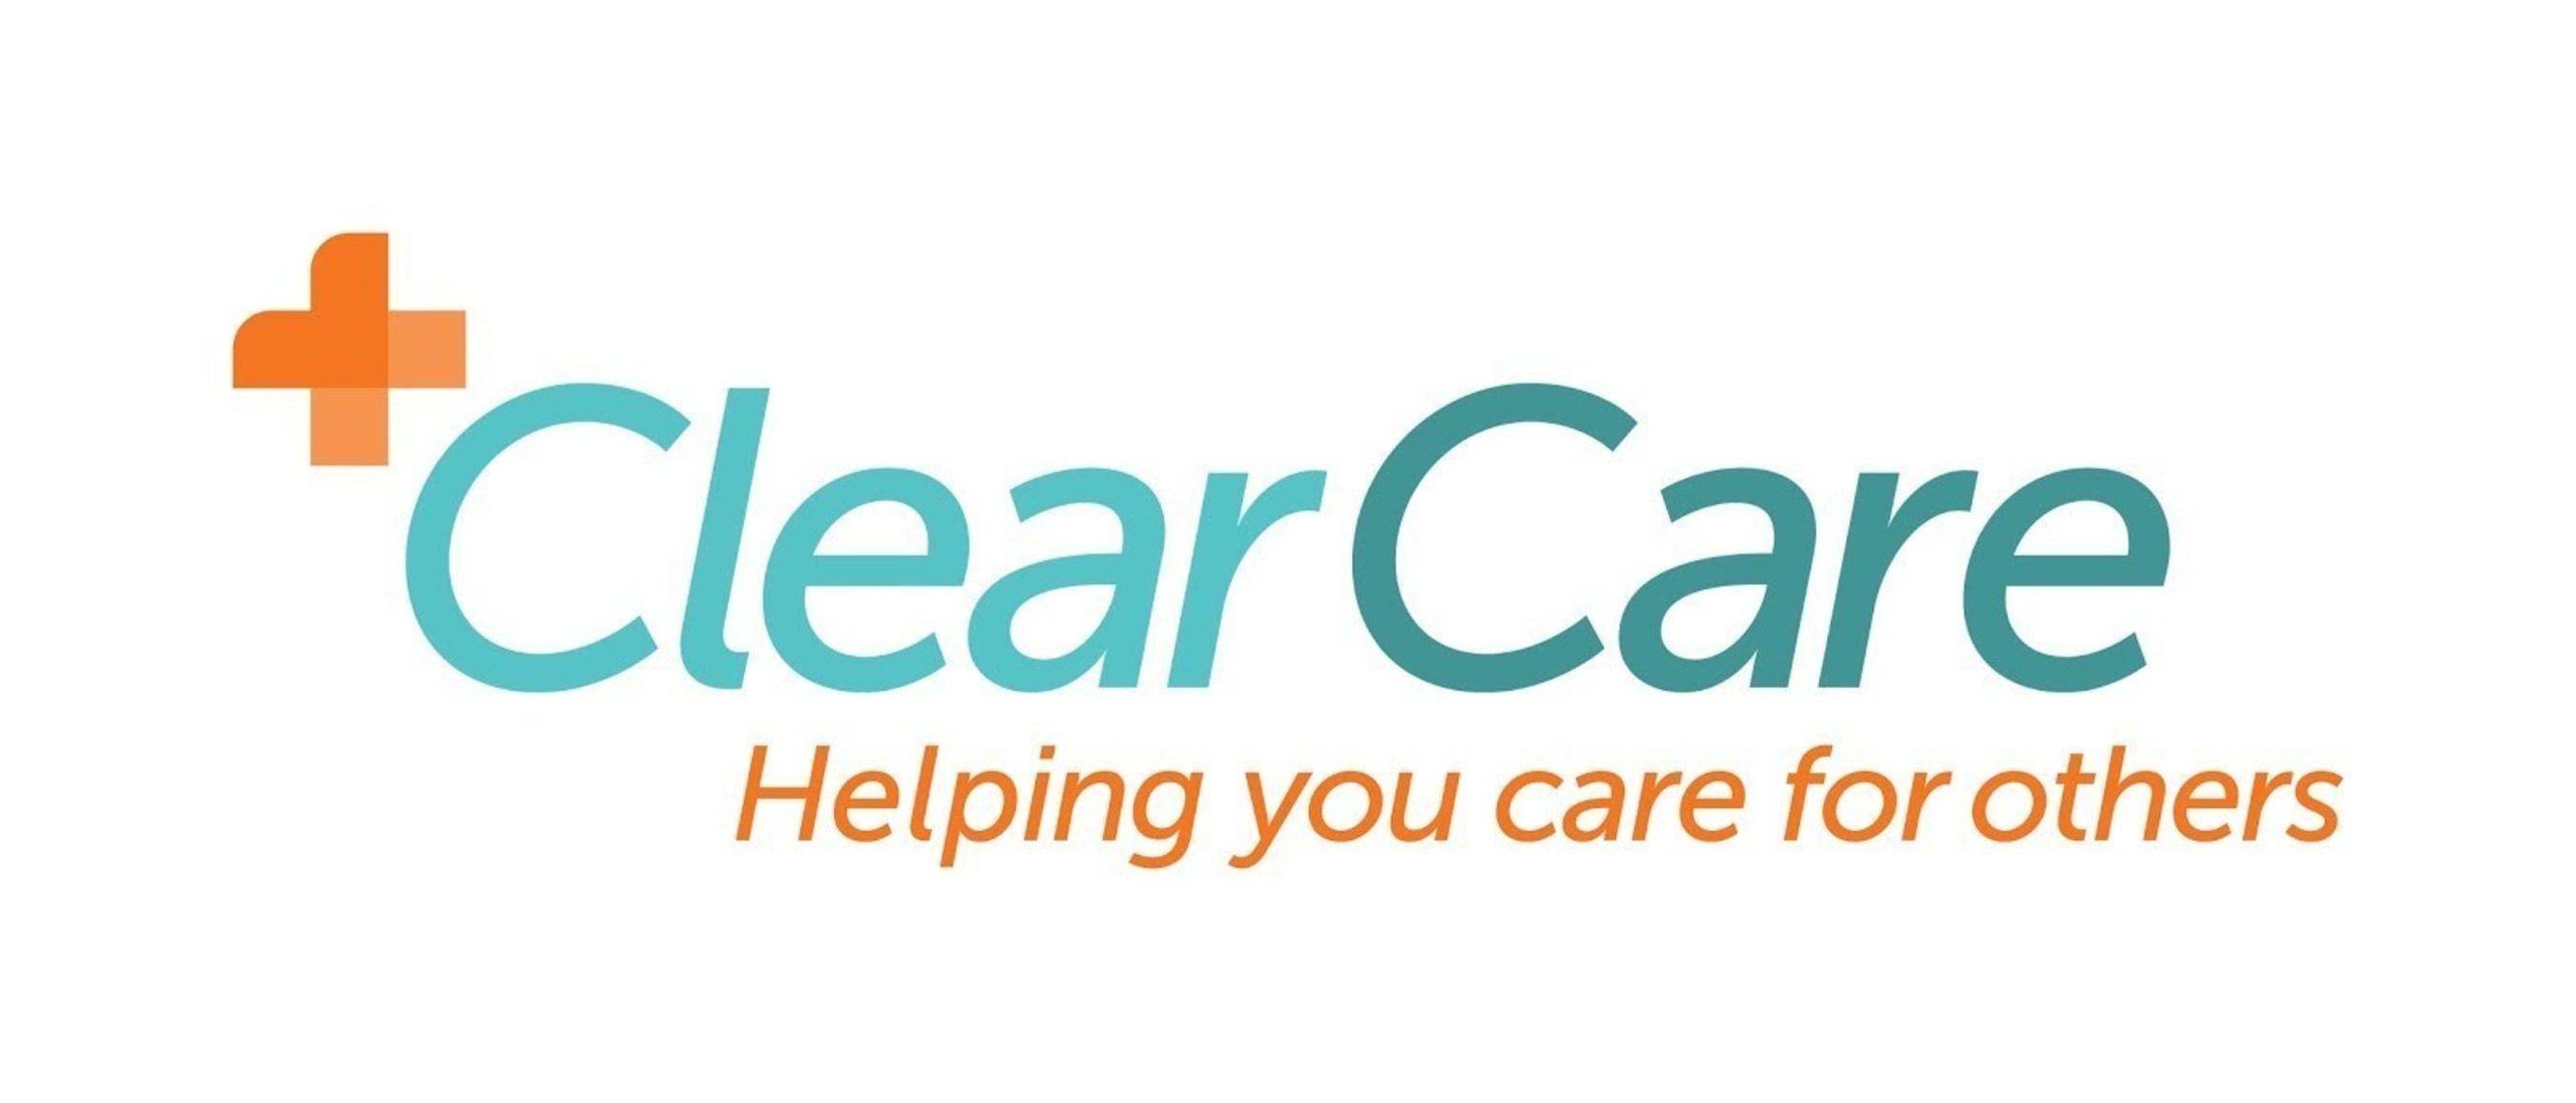 www.clearcareonline.com (PRNewsFoto/ClearCare)